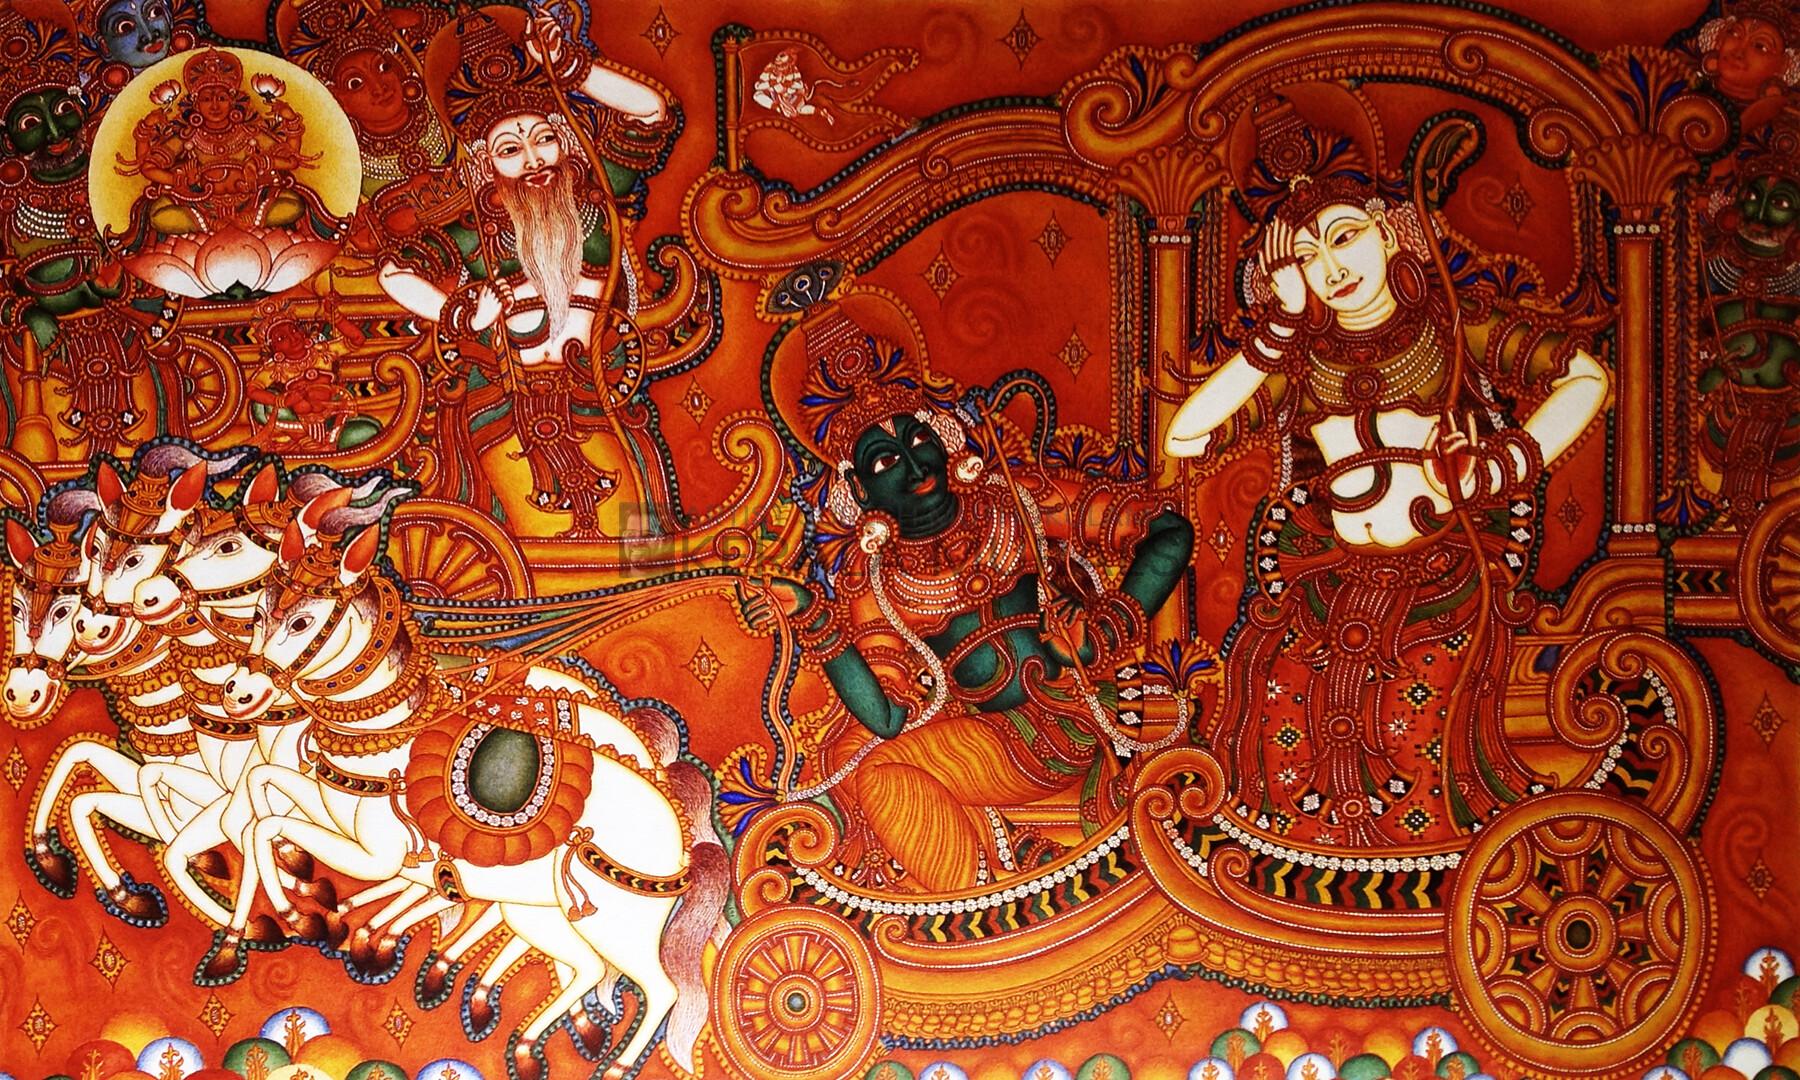 Geethopadhesha